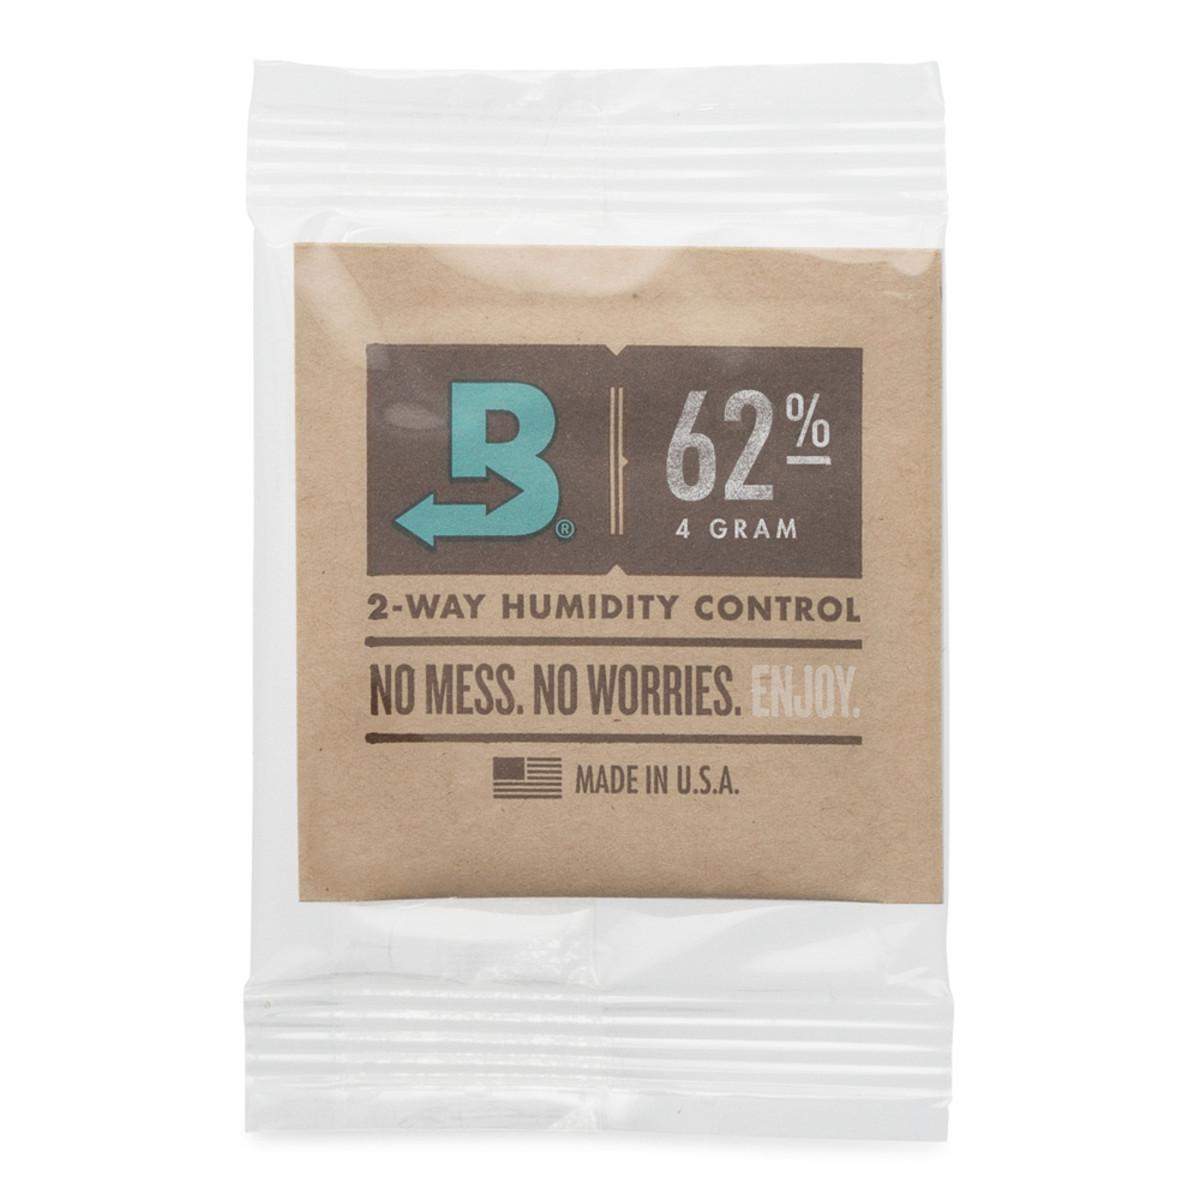 Boveda 62% 4 g packet